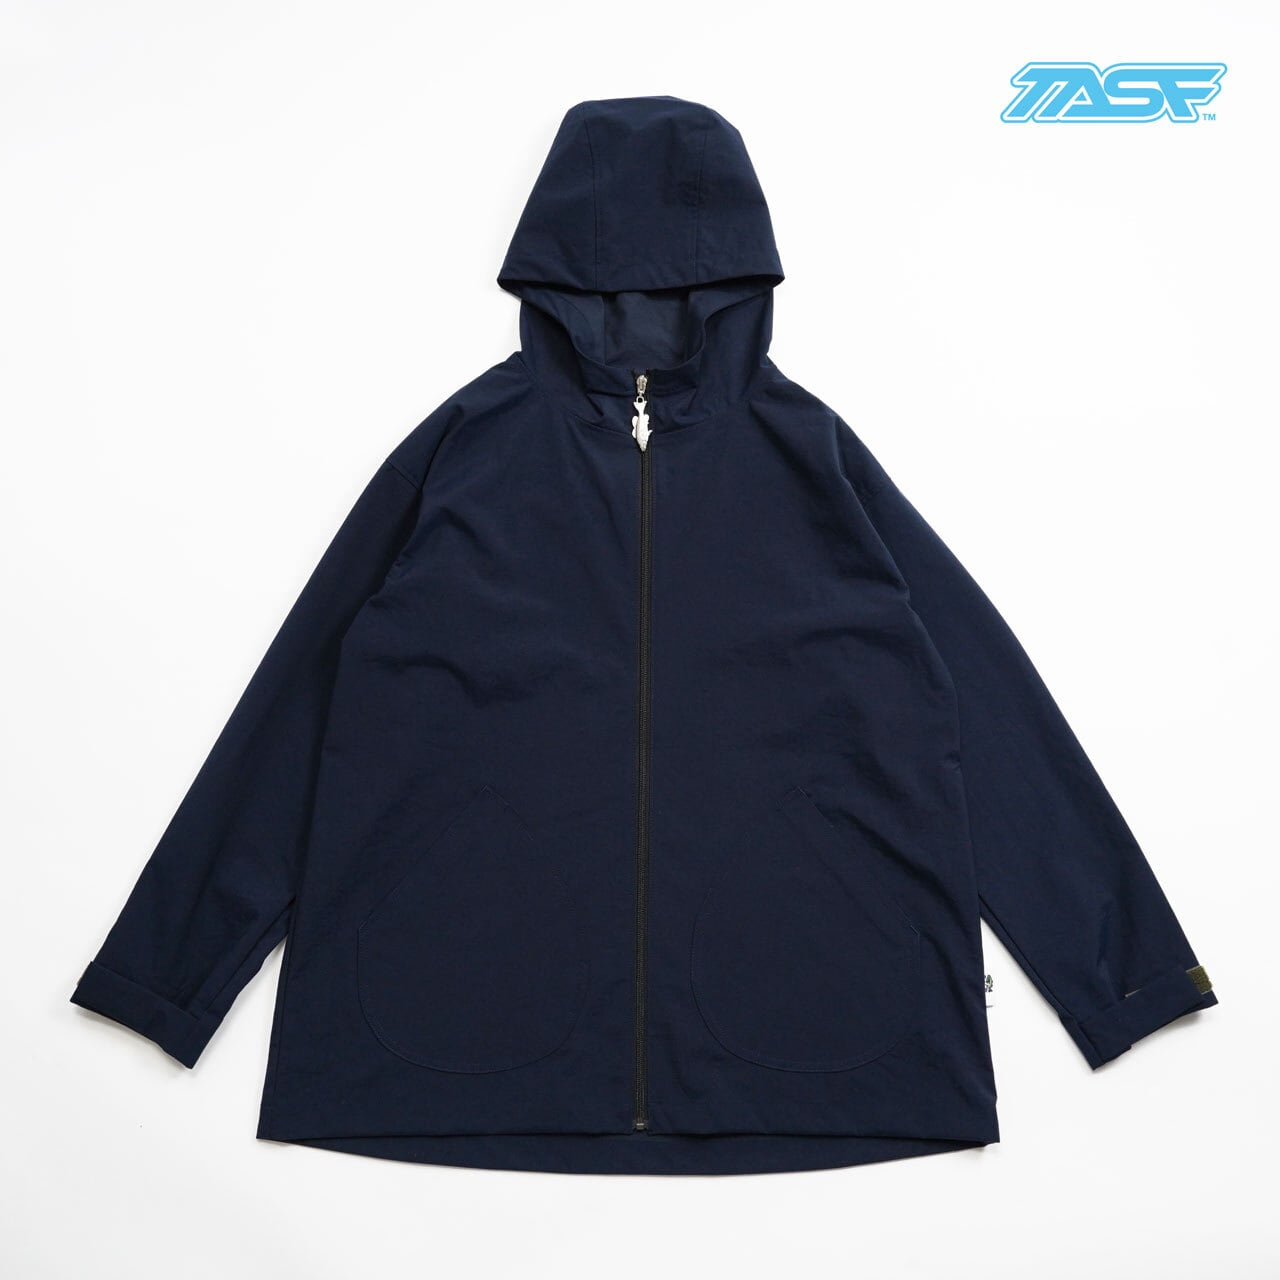 TASF  /   Fish Parka  /  Navy